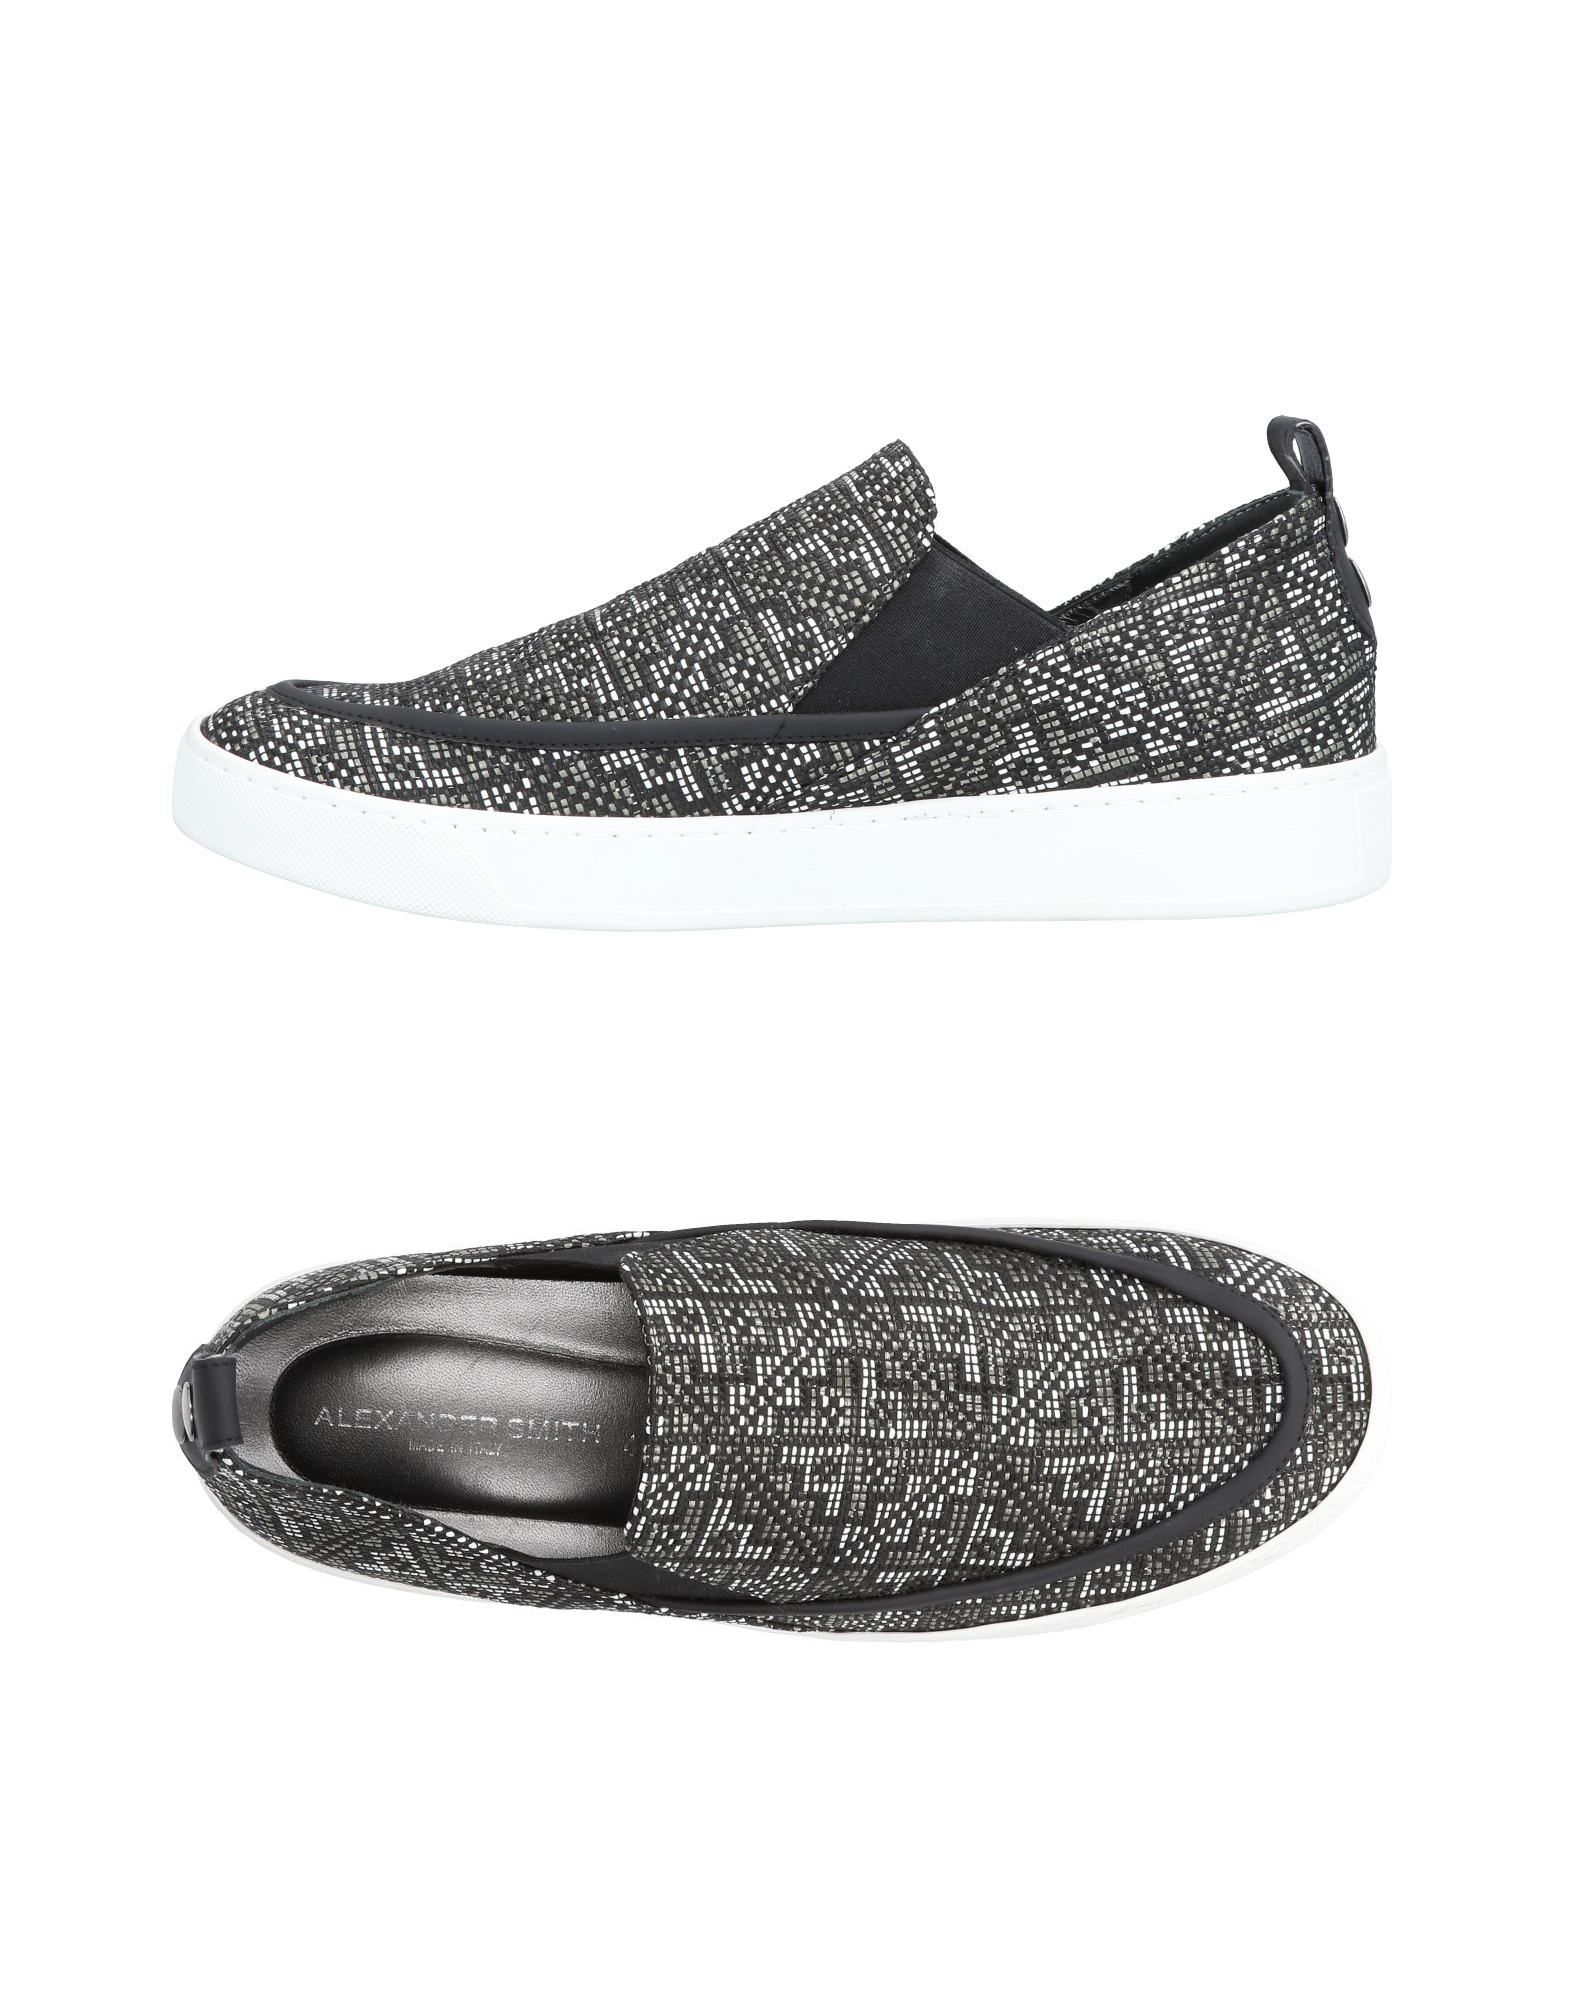 Sneakers Alexander Smith 11483853PK Uomo - 11483853PK Smith fe82b0